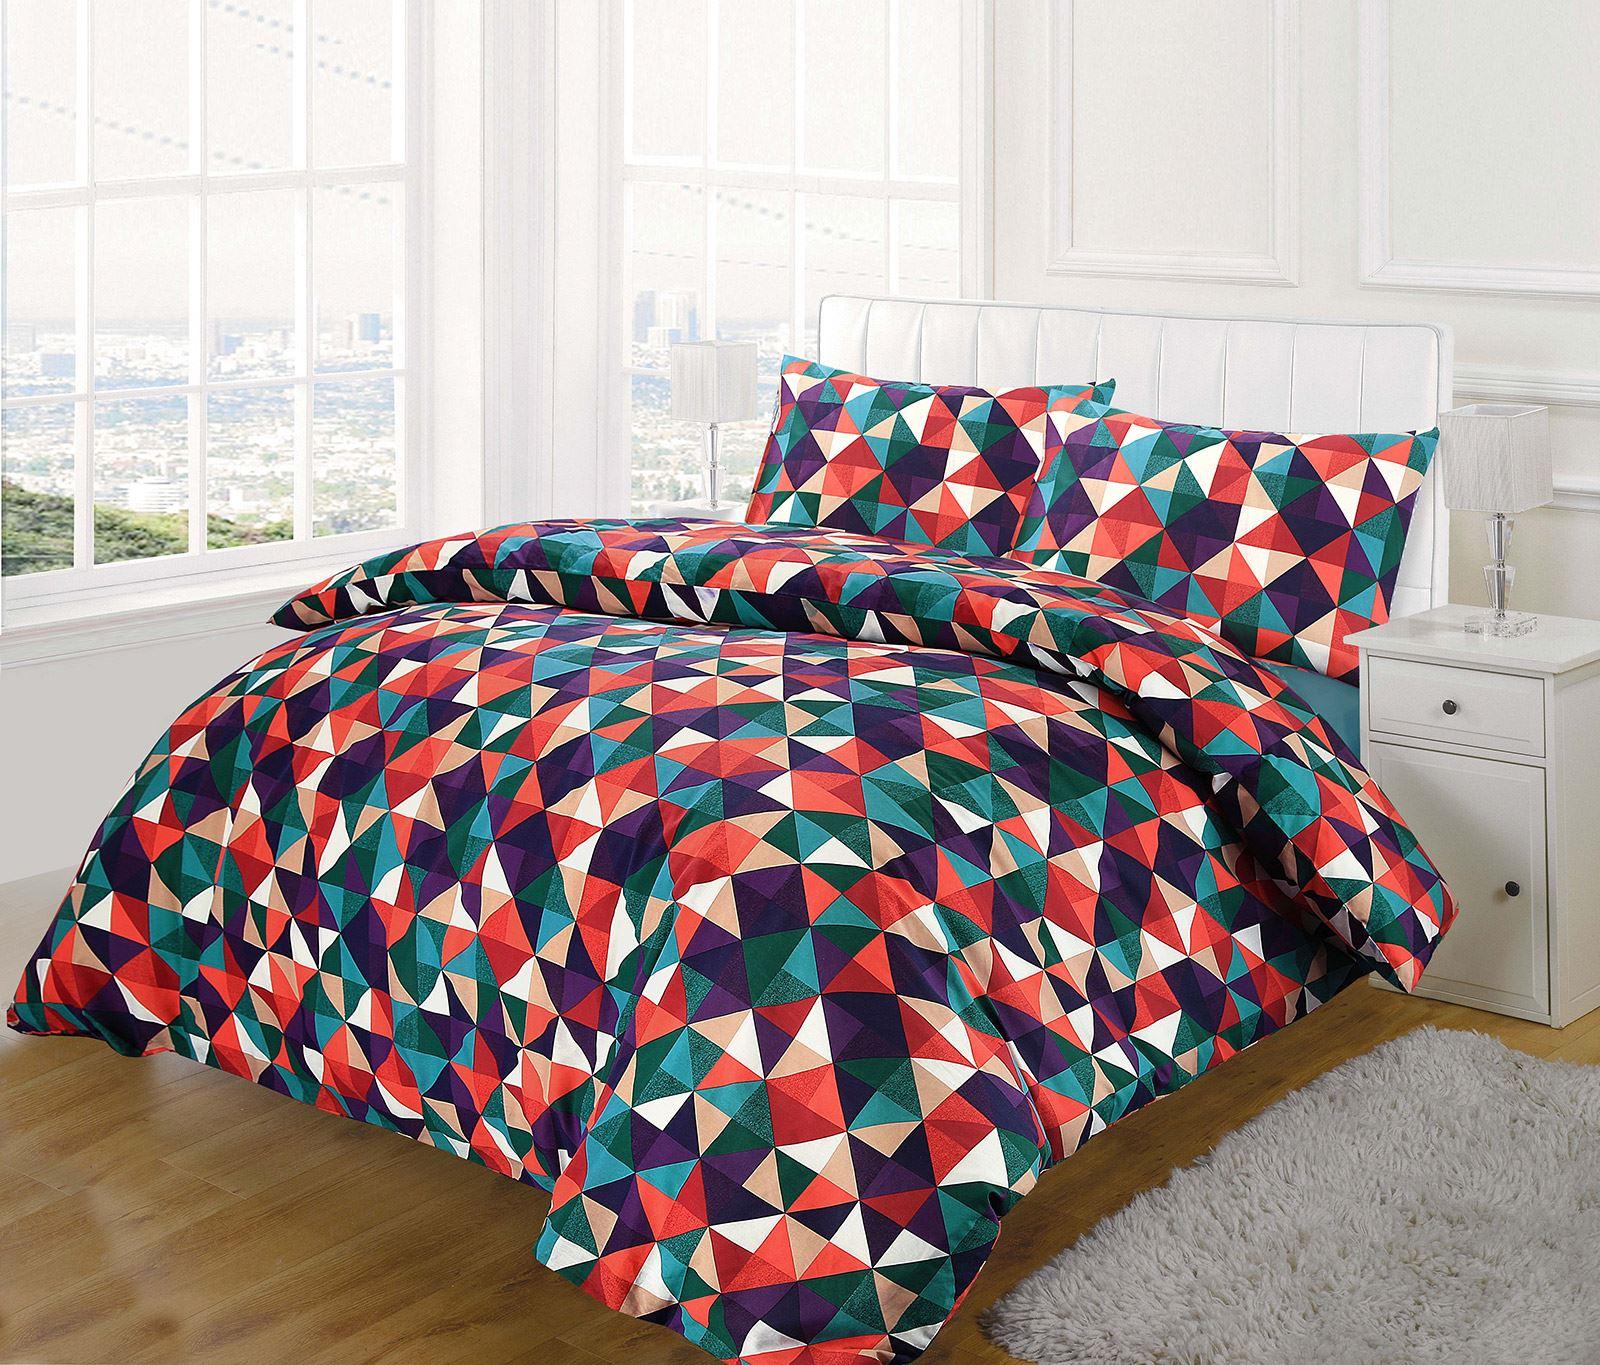 multi colored duvet cover - multi colored duvet cover